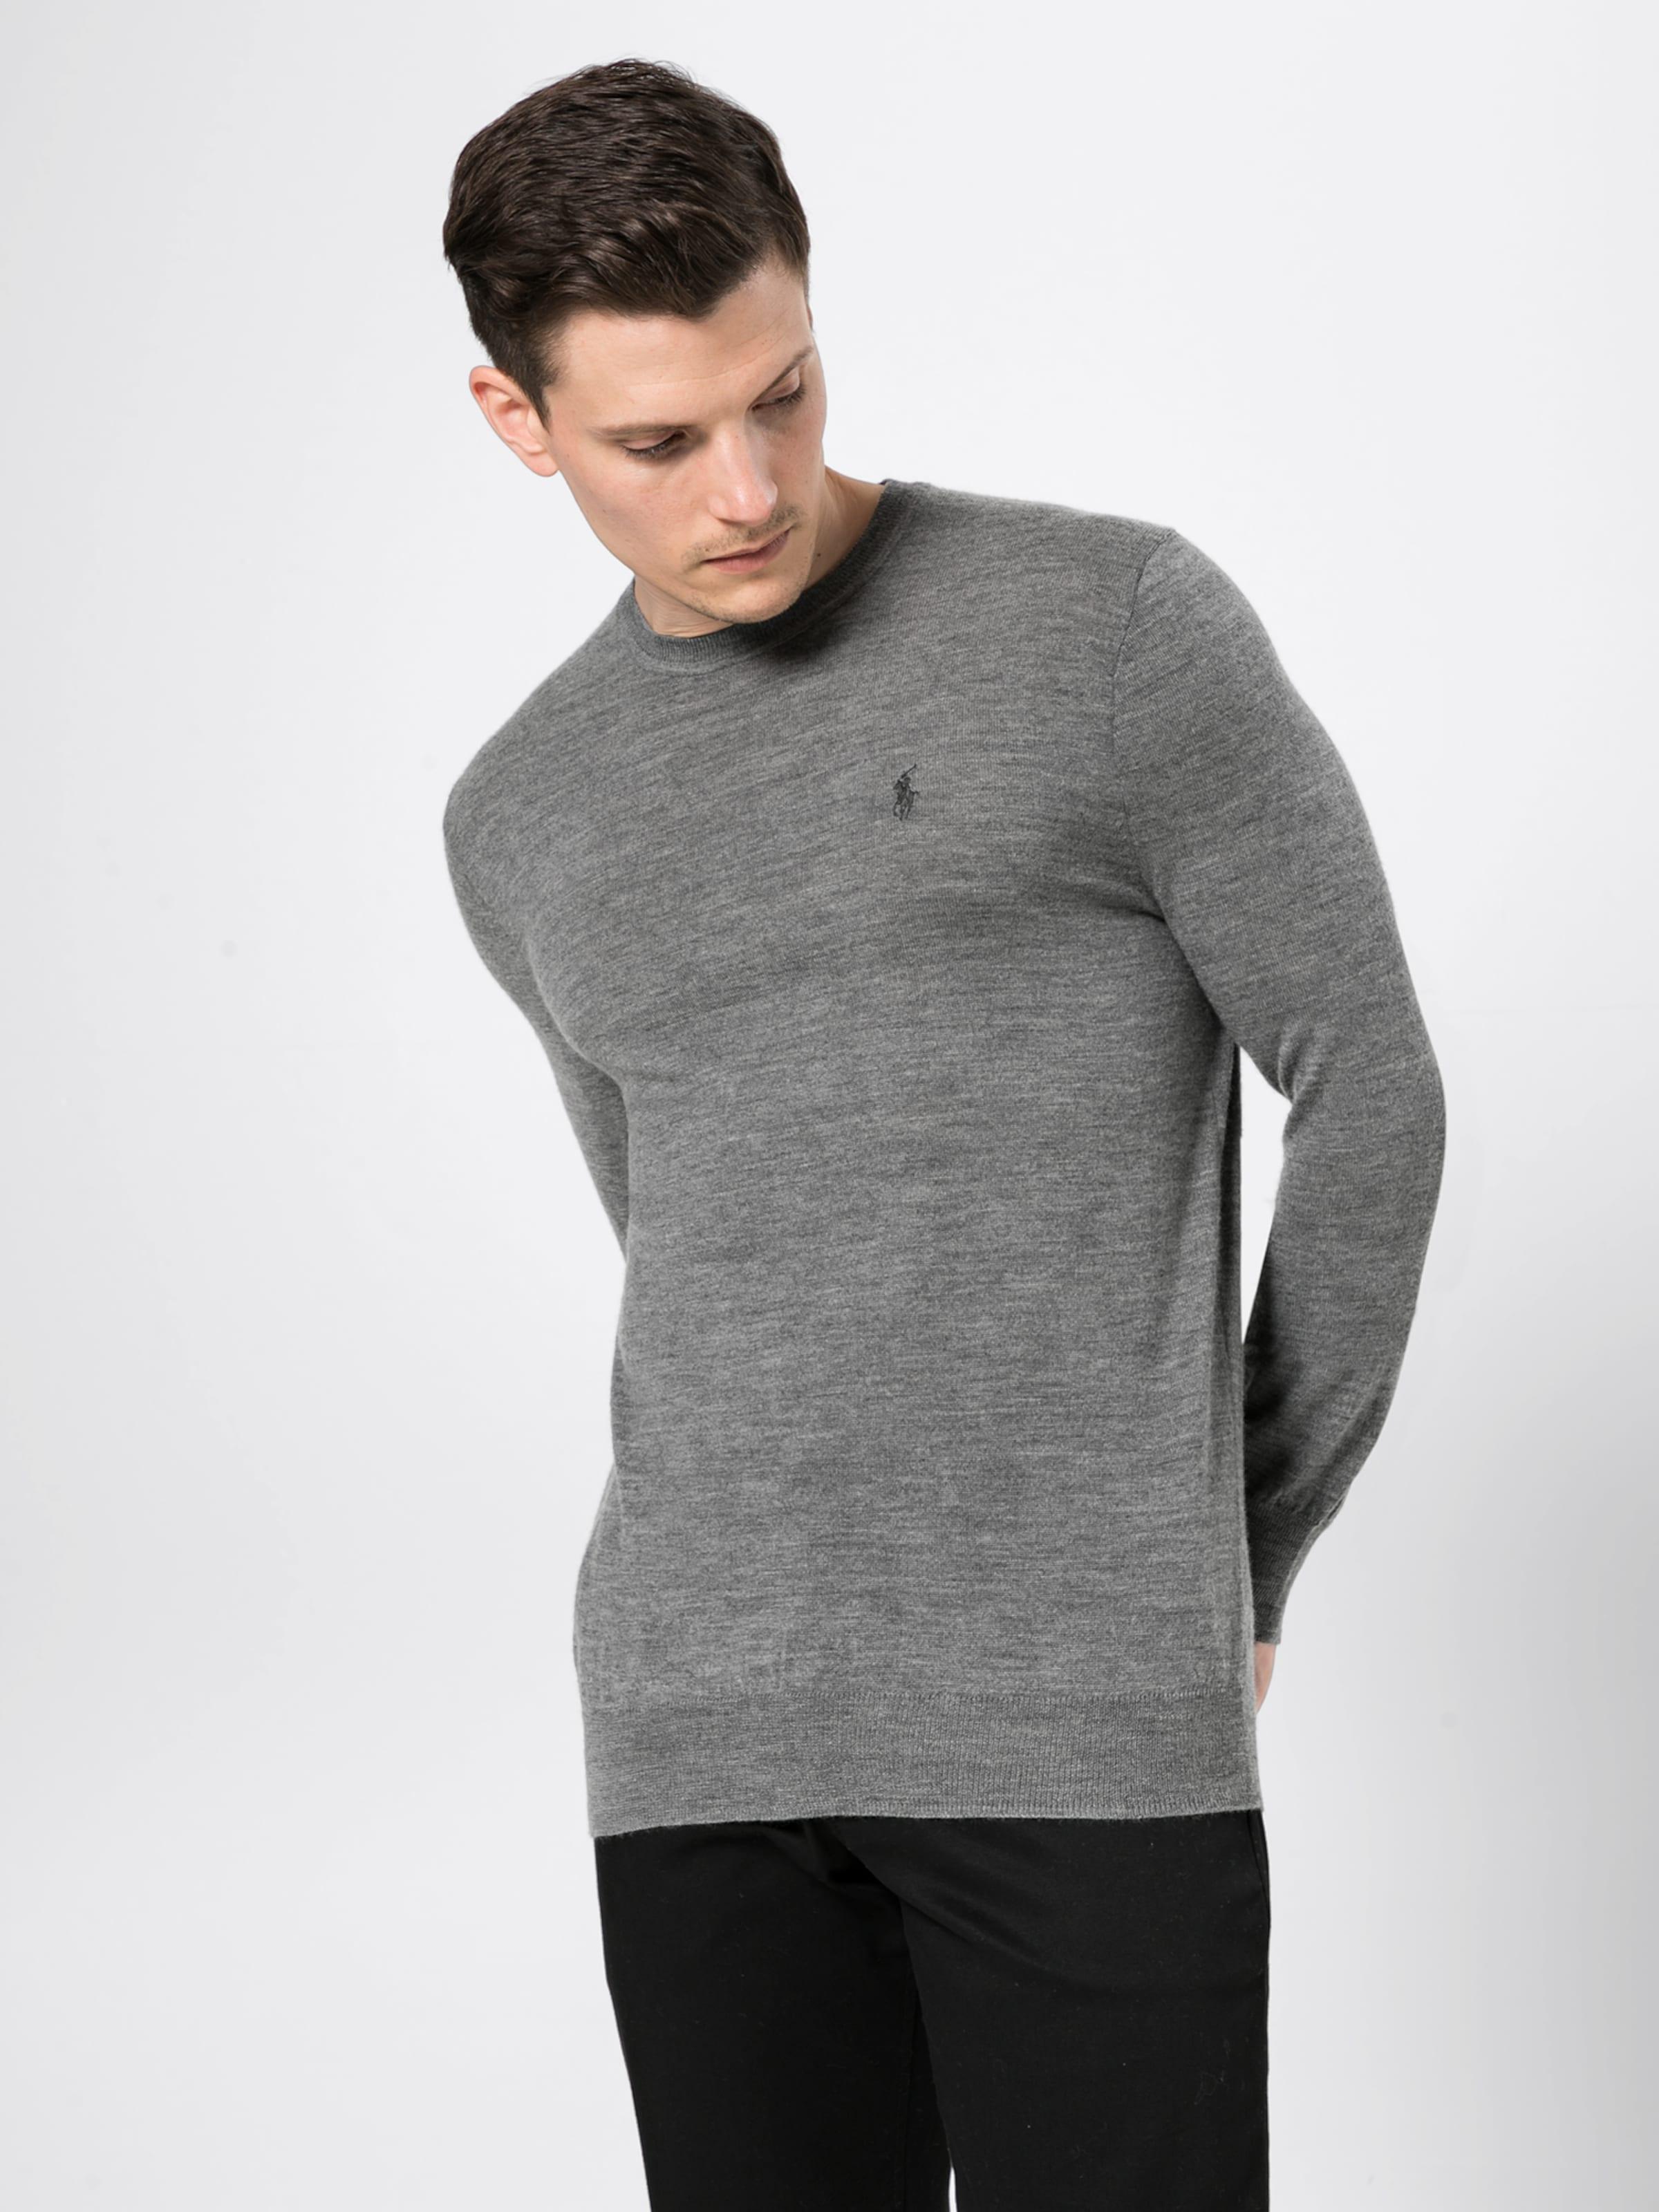 Pullover Ralph Lauren Grau Polo In PXkZiOu